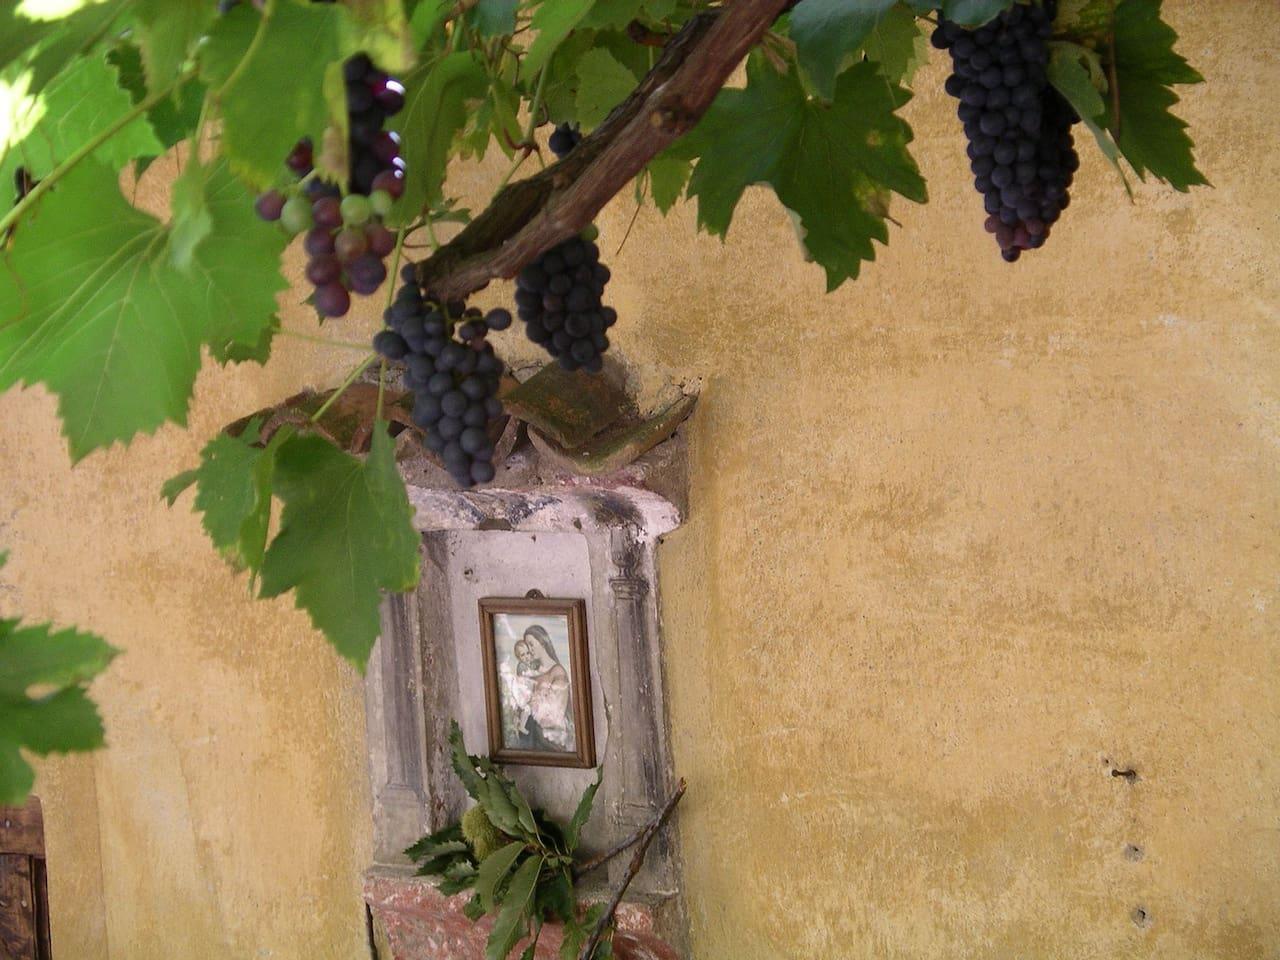 The vine-covered pergola